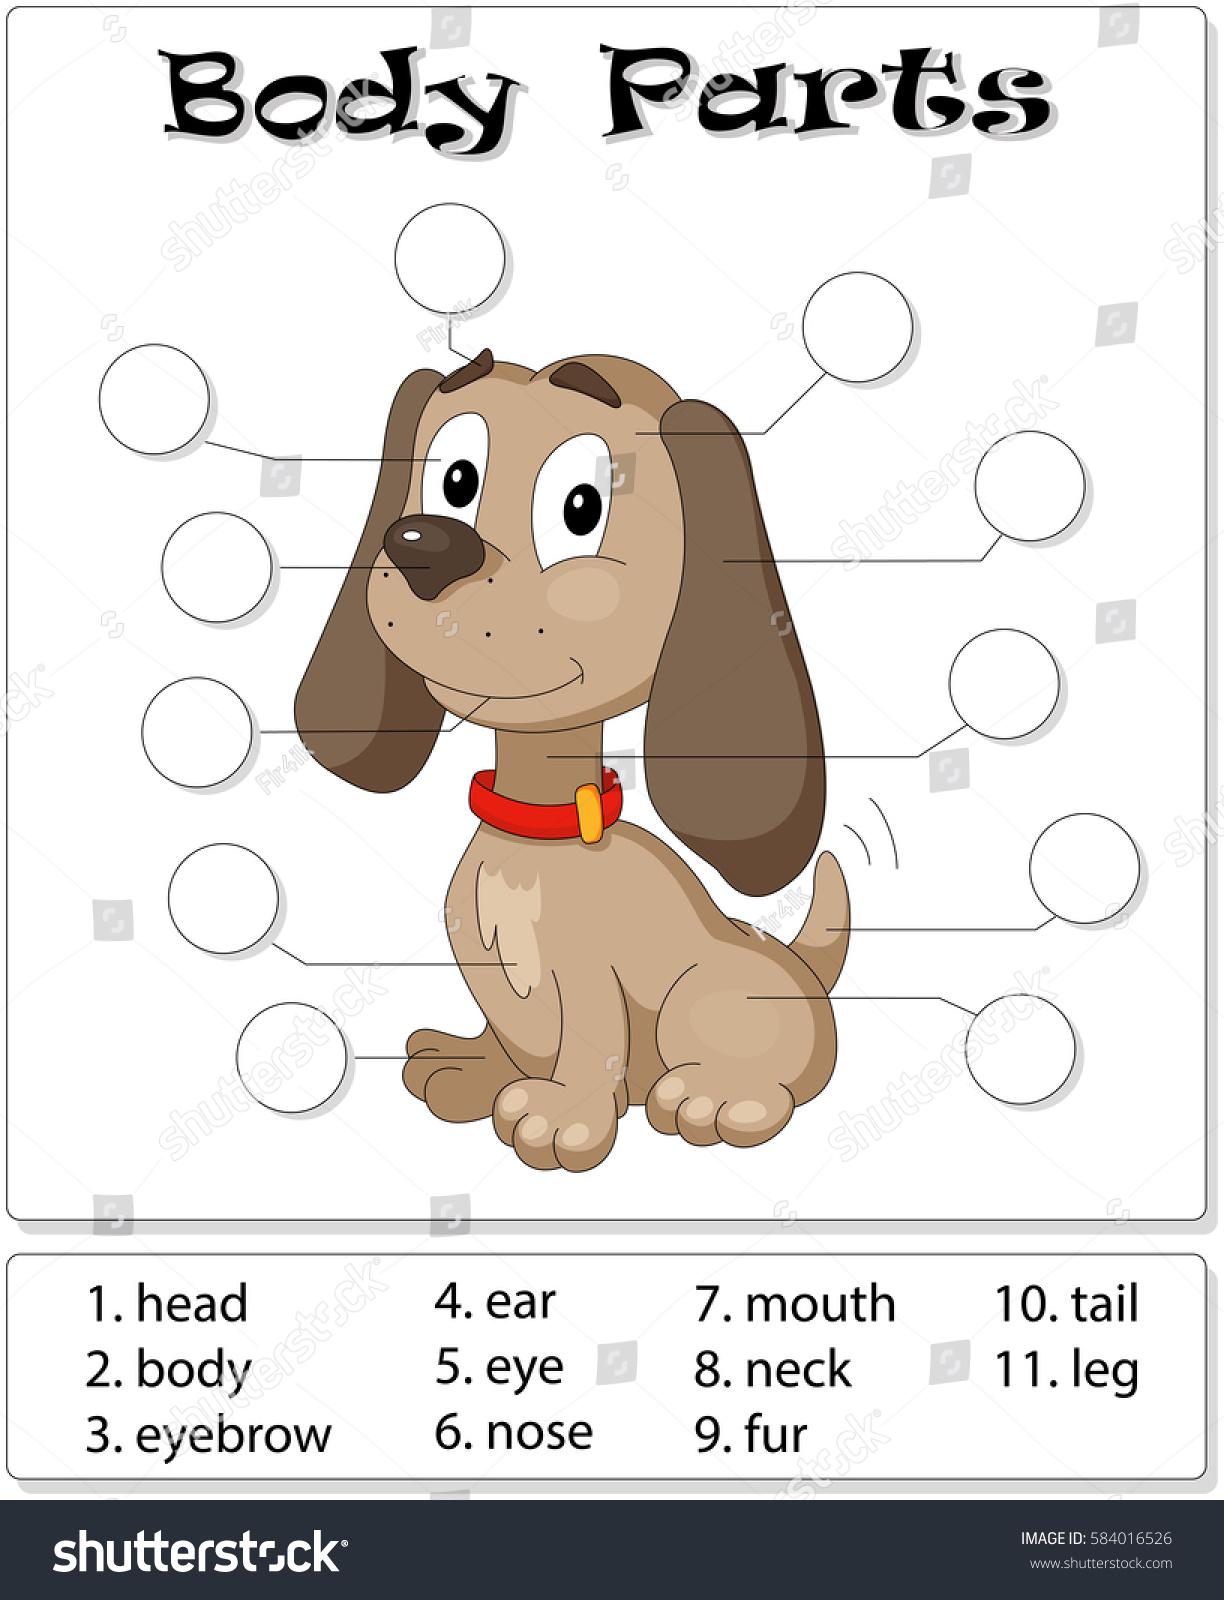 Dog Body Parts Animal Anatomy English Stock Vector